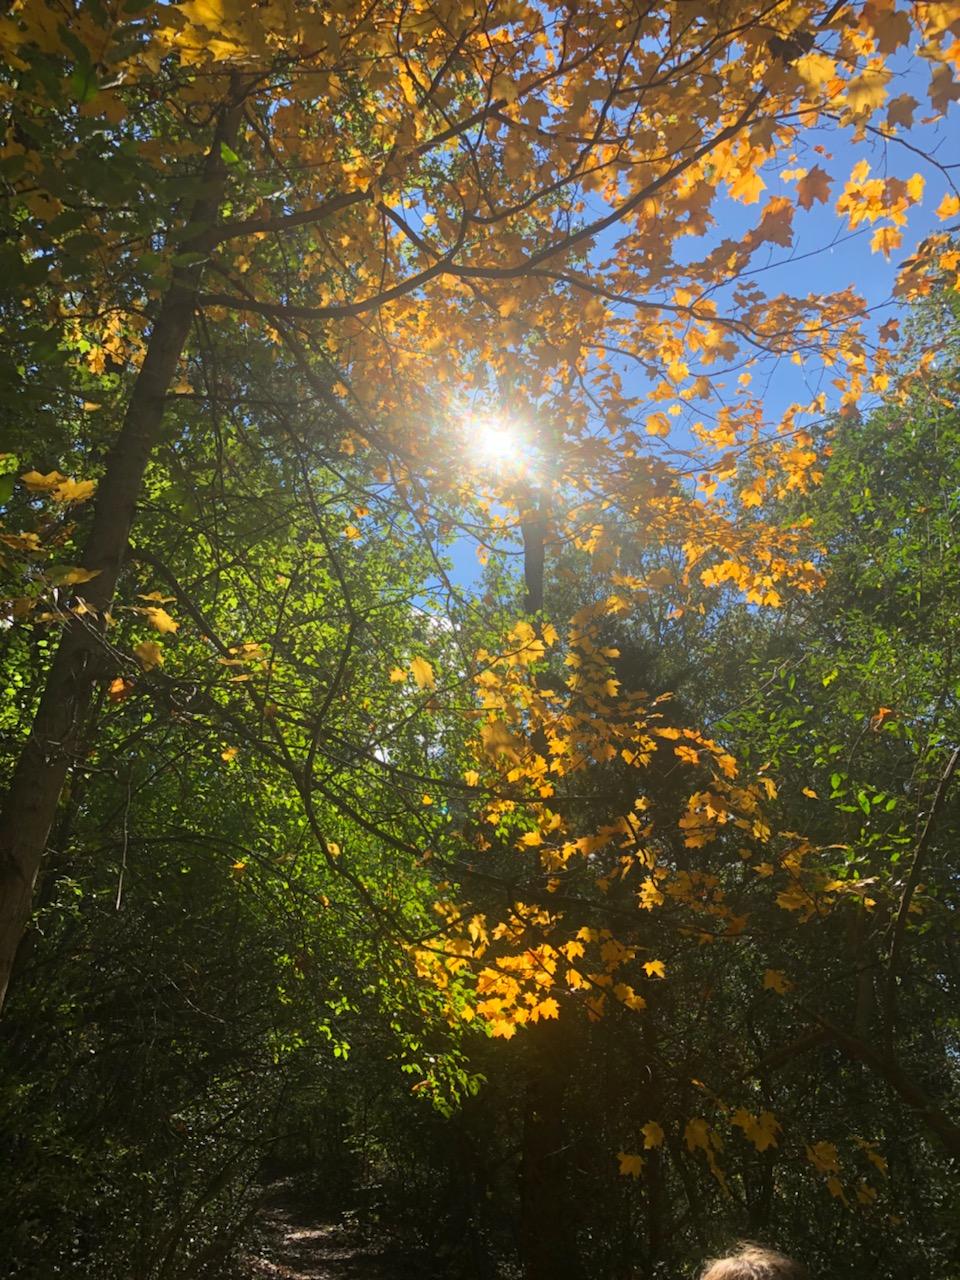 Light through the fall trees